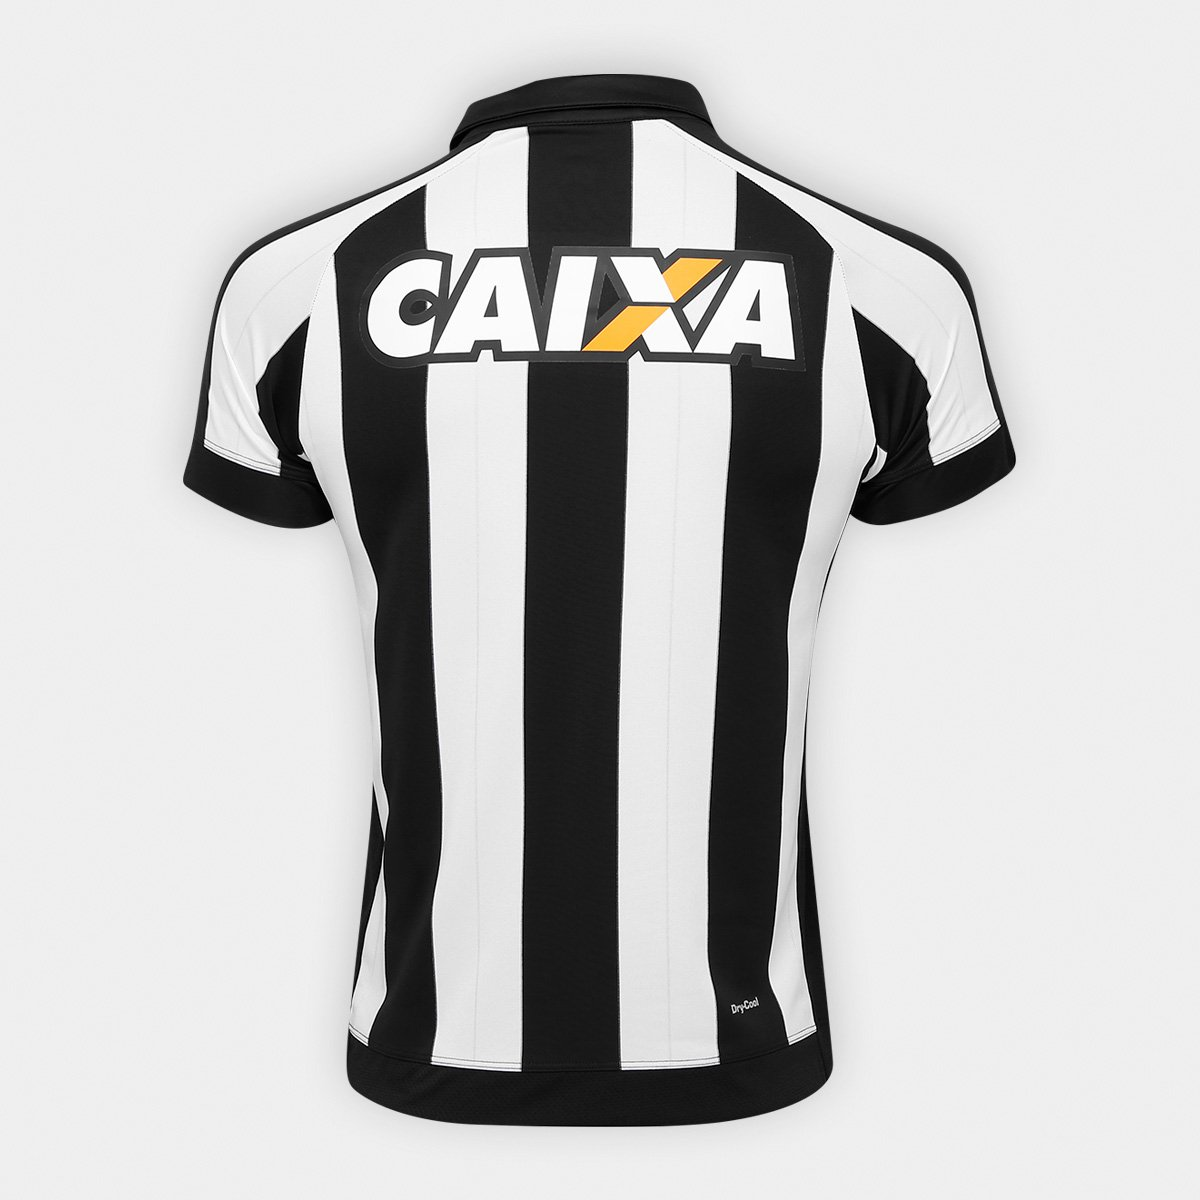 d0d286c8da ... Camisa Botafogo I 17 18 C  Patrocínio s n° - Torcedor Topper ...